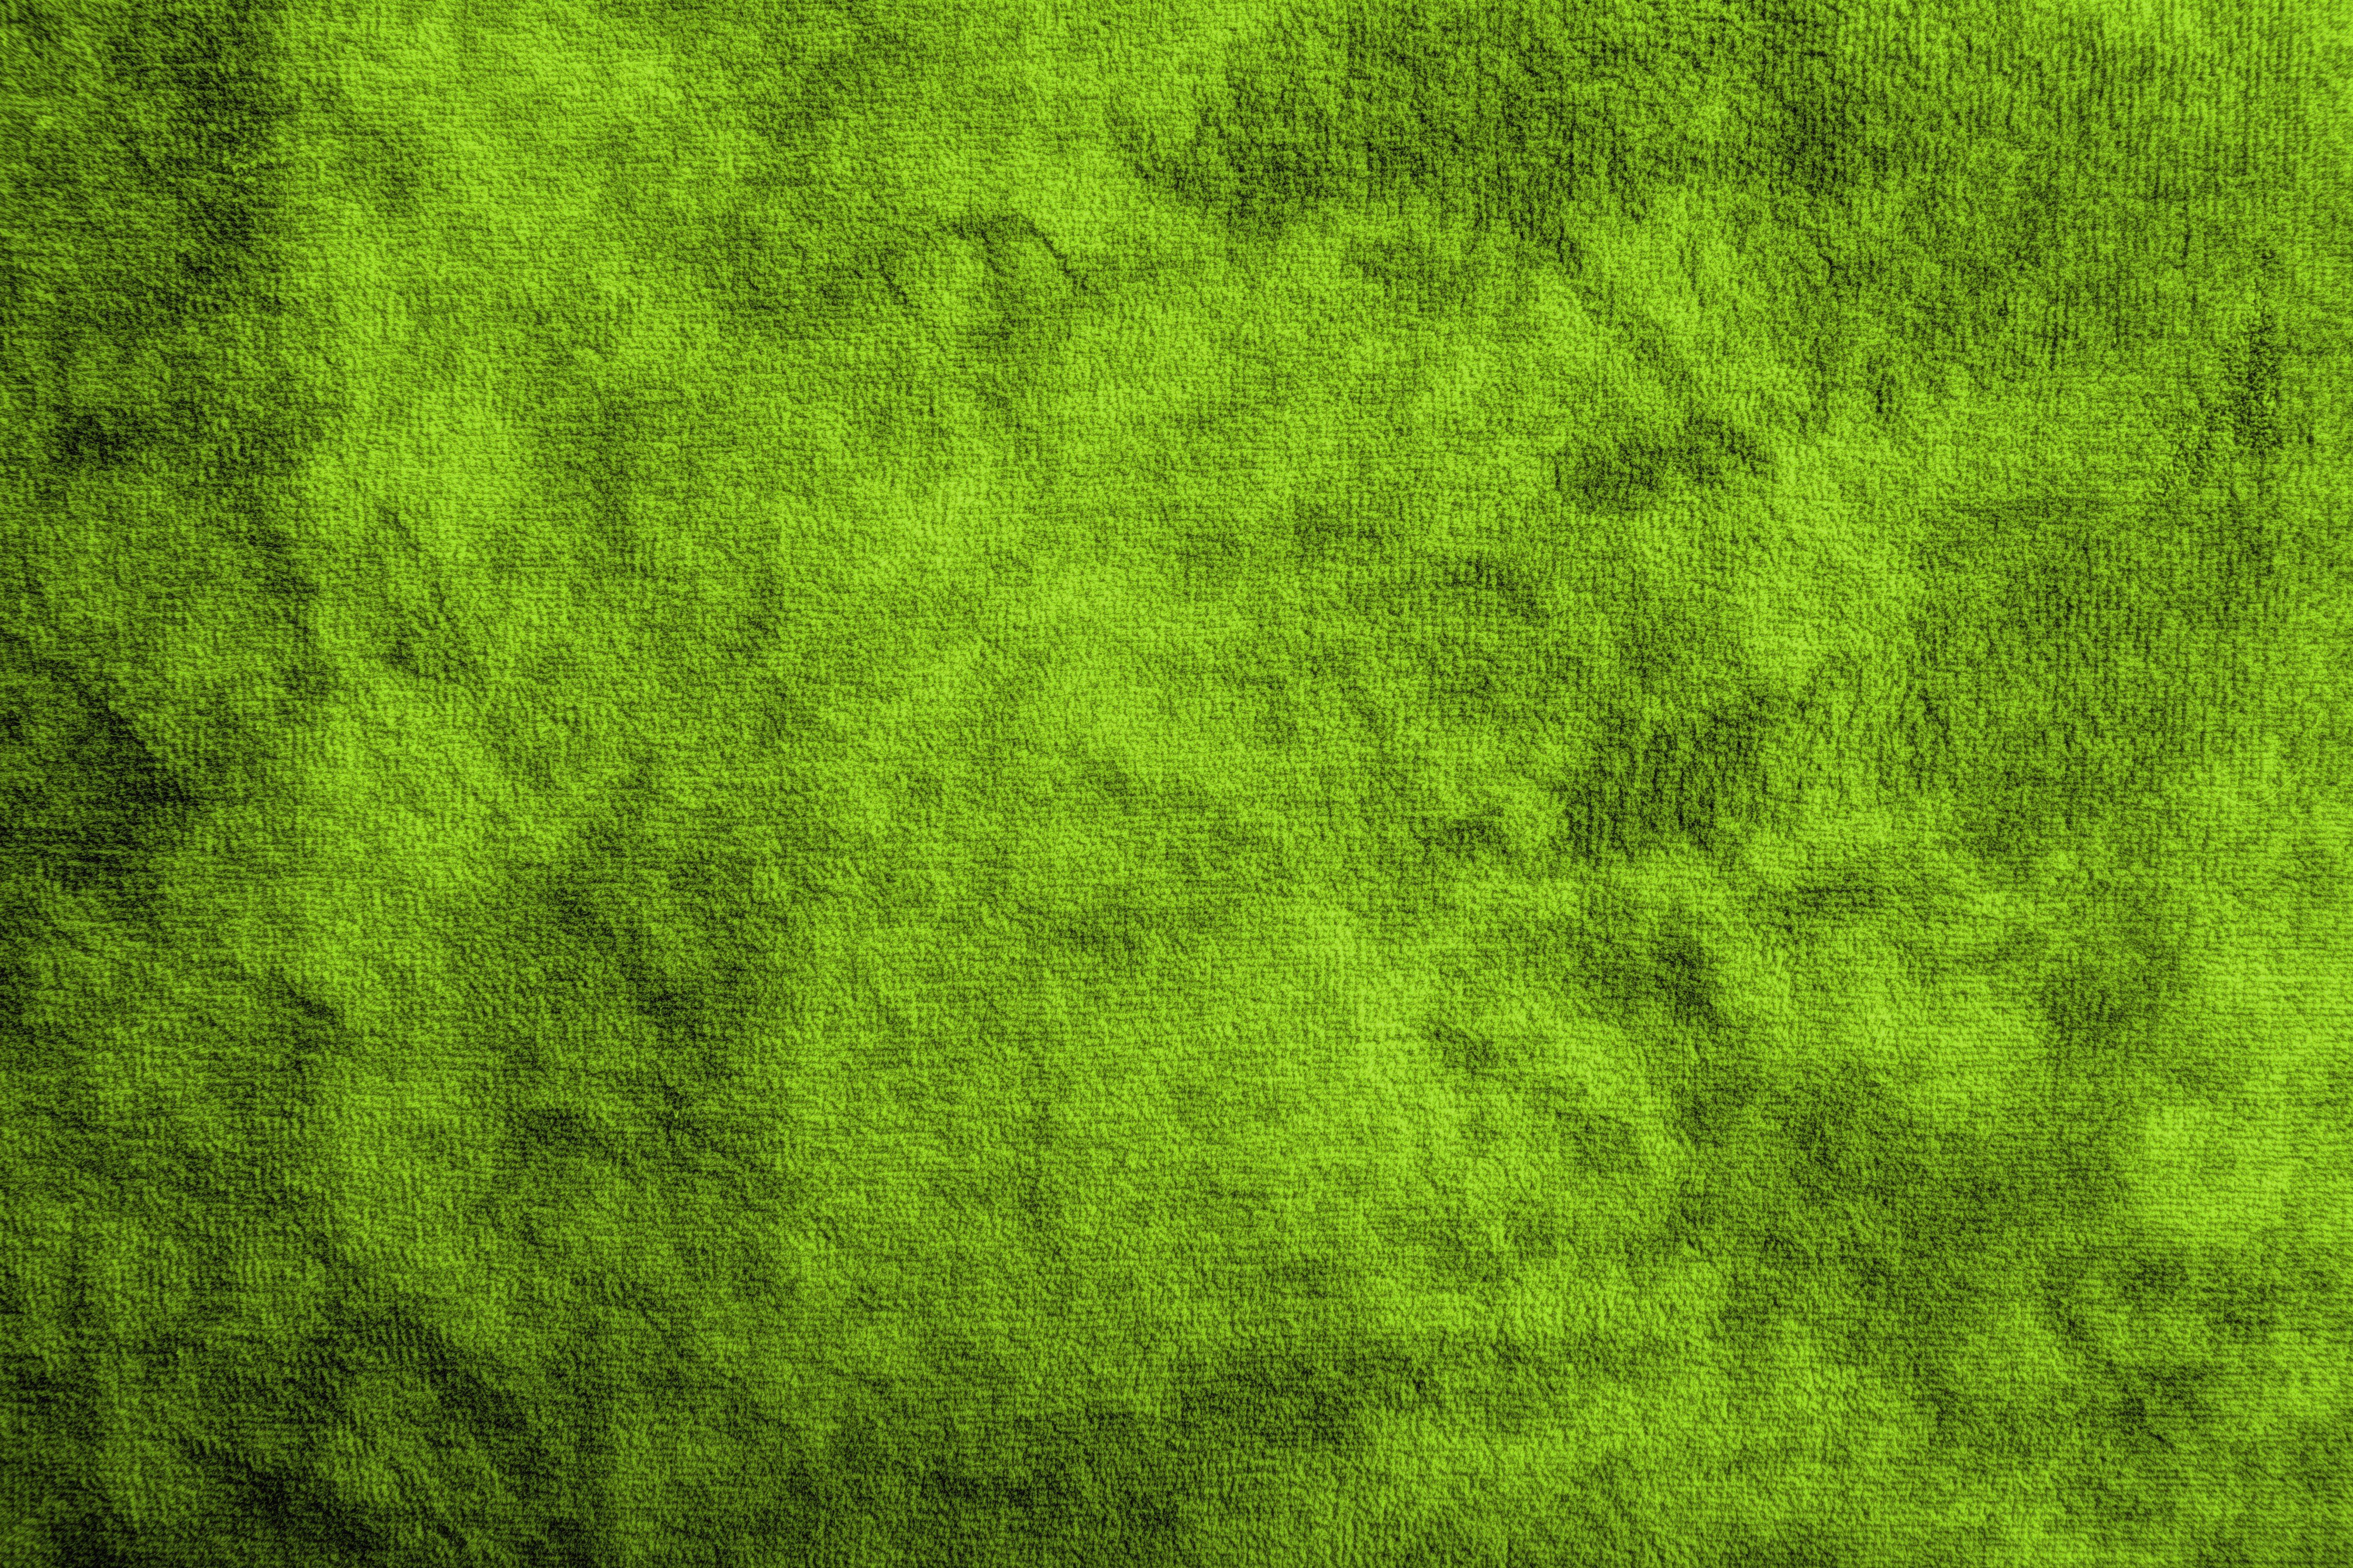 Pin by Lynn Zeng on PS resource | Green texture, Green fur ...